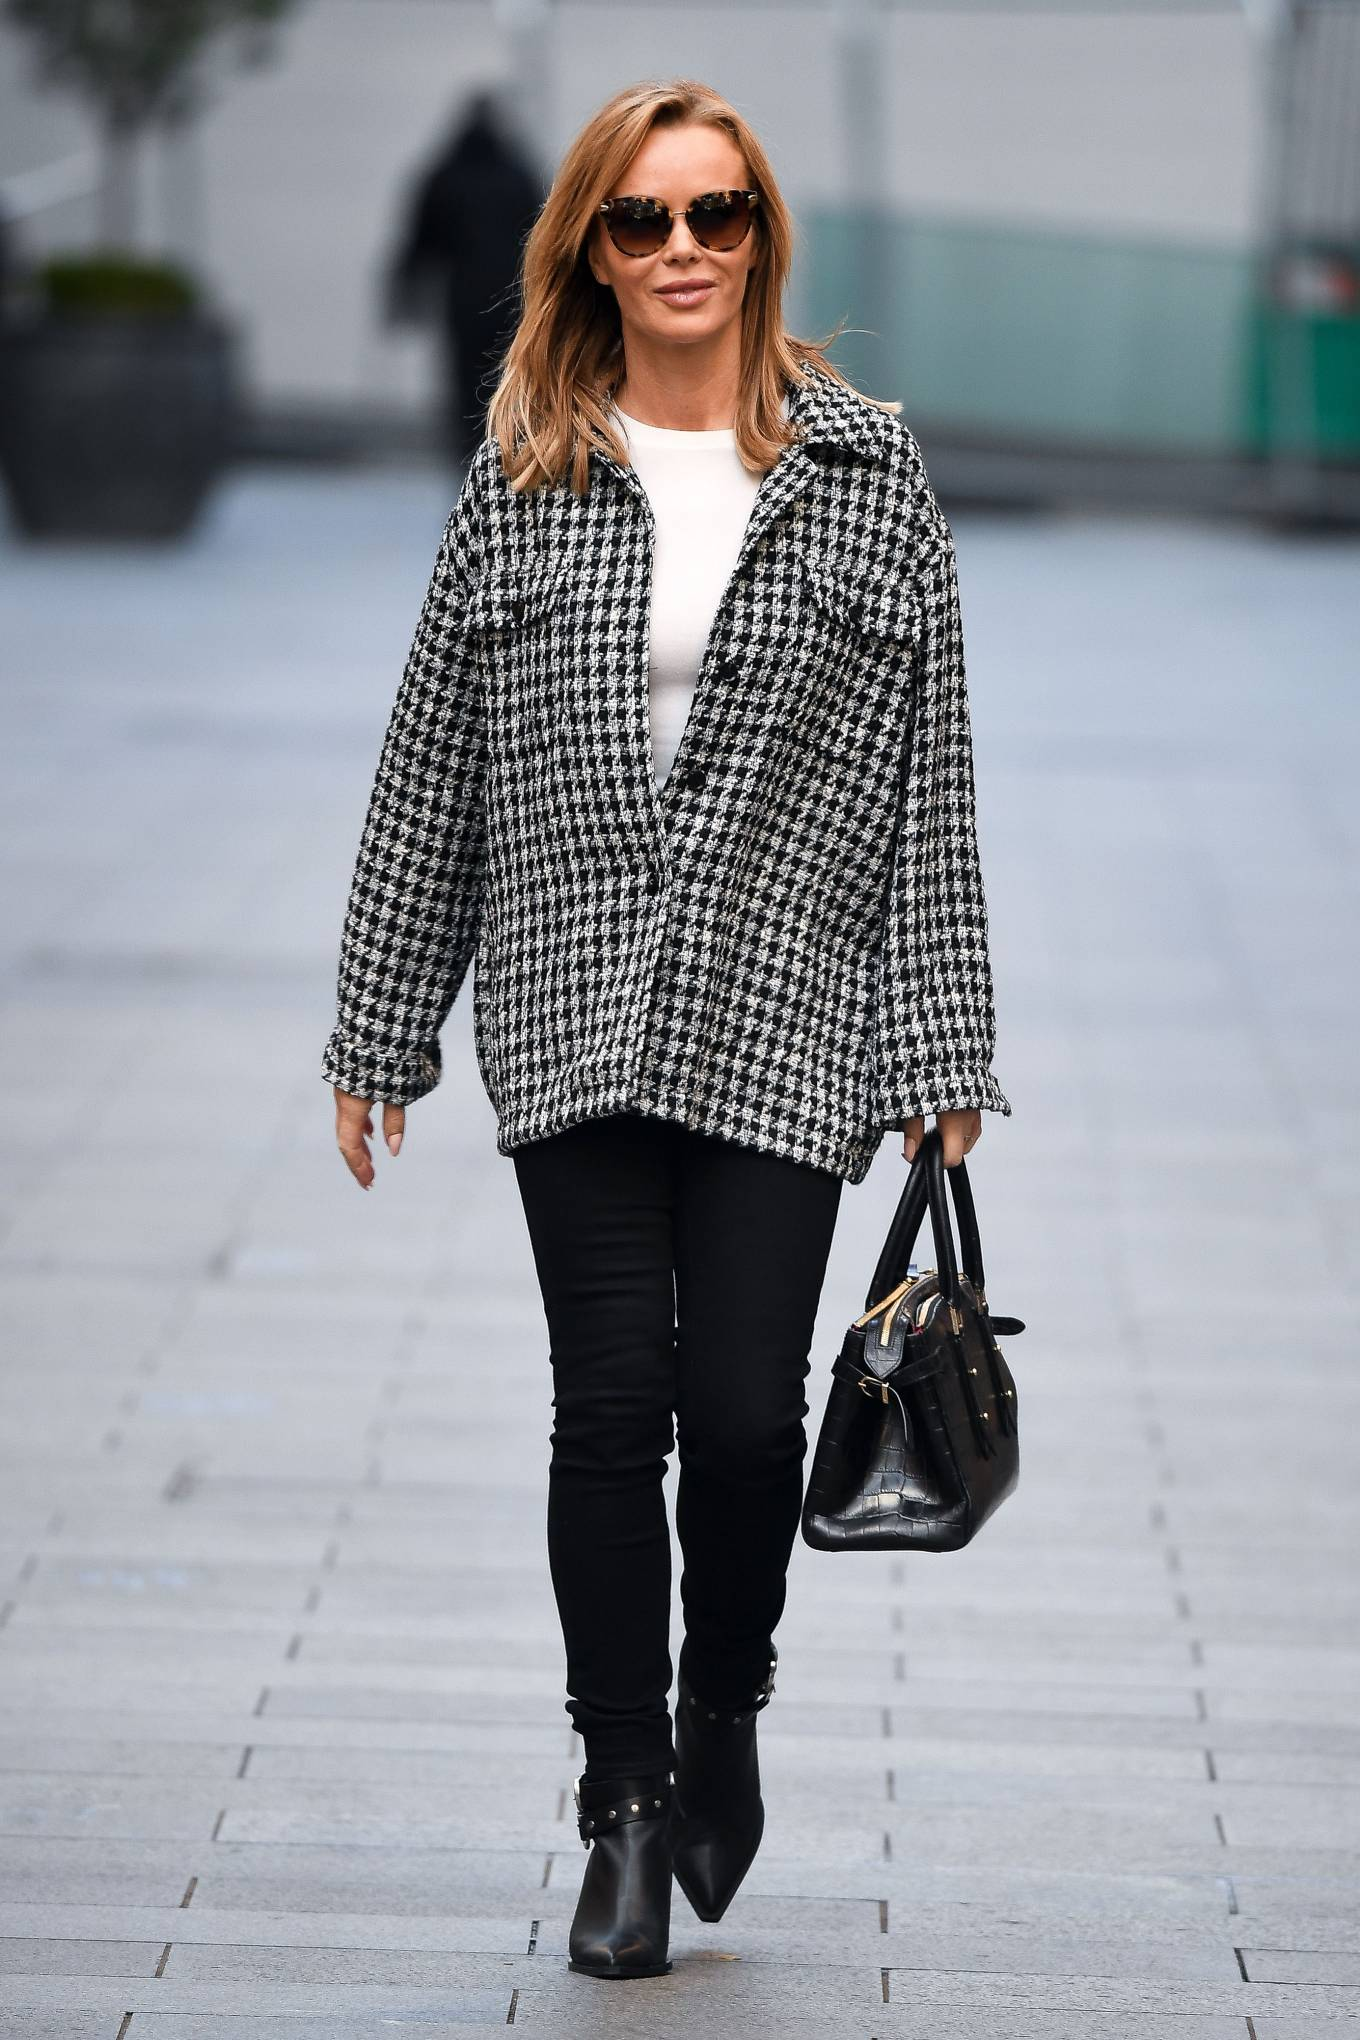 Amanda Holden - Seen after the Heart Radio Breakfast show in London